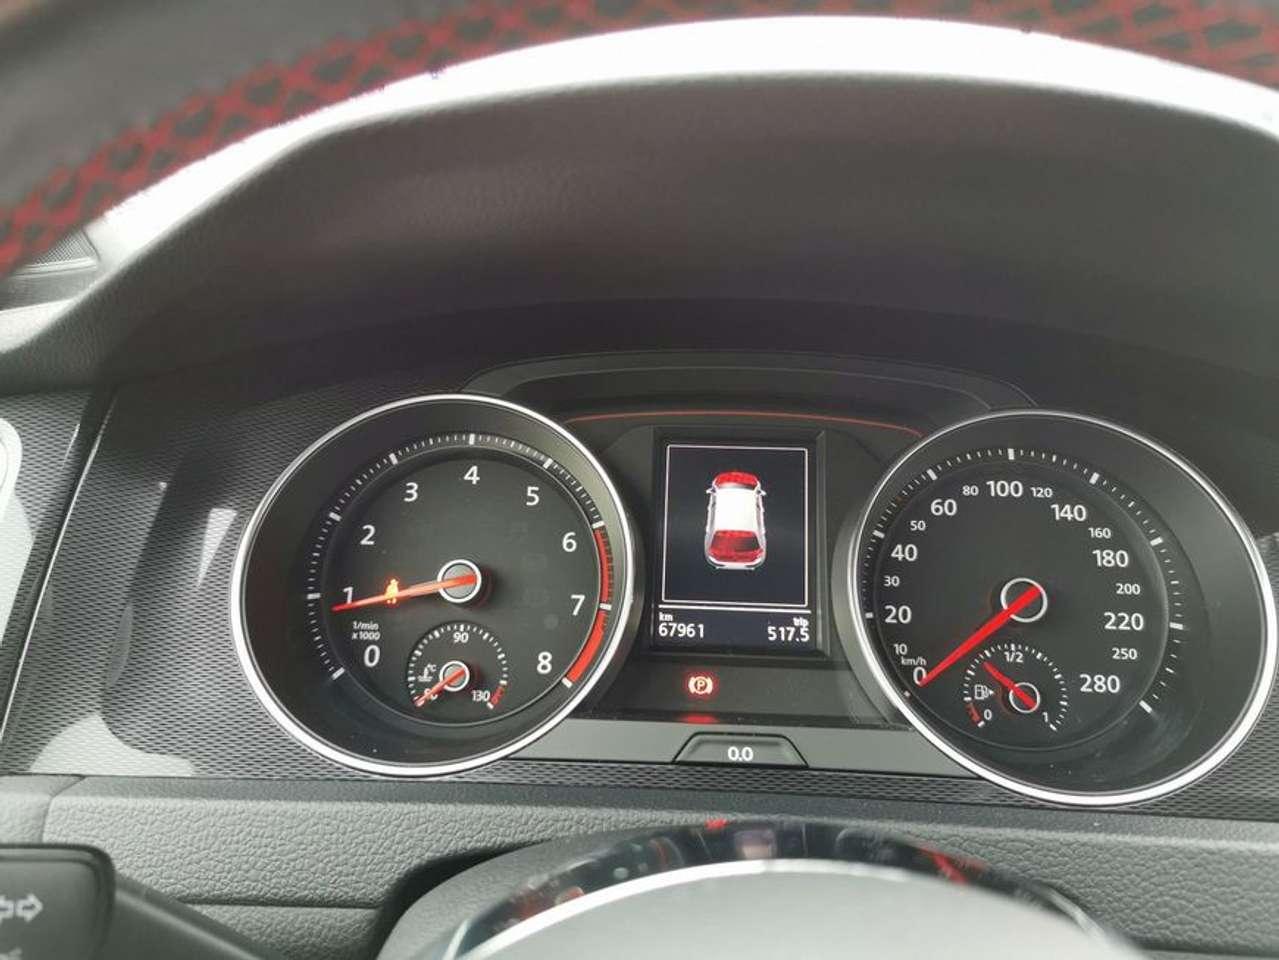 Volkswagen Golf GTI 7 Performance